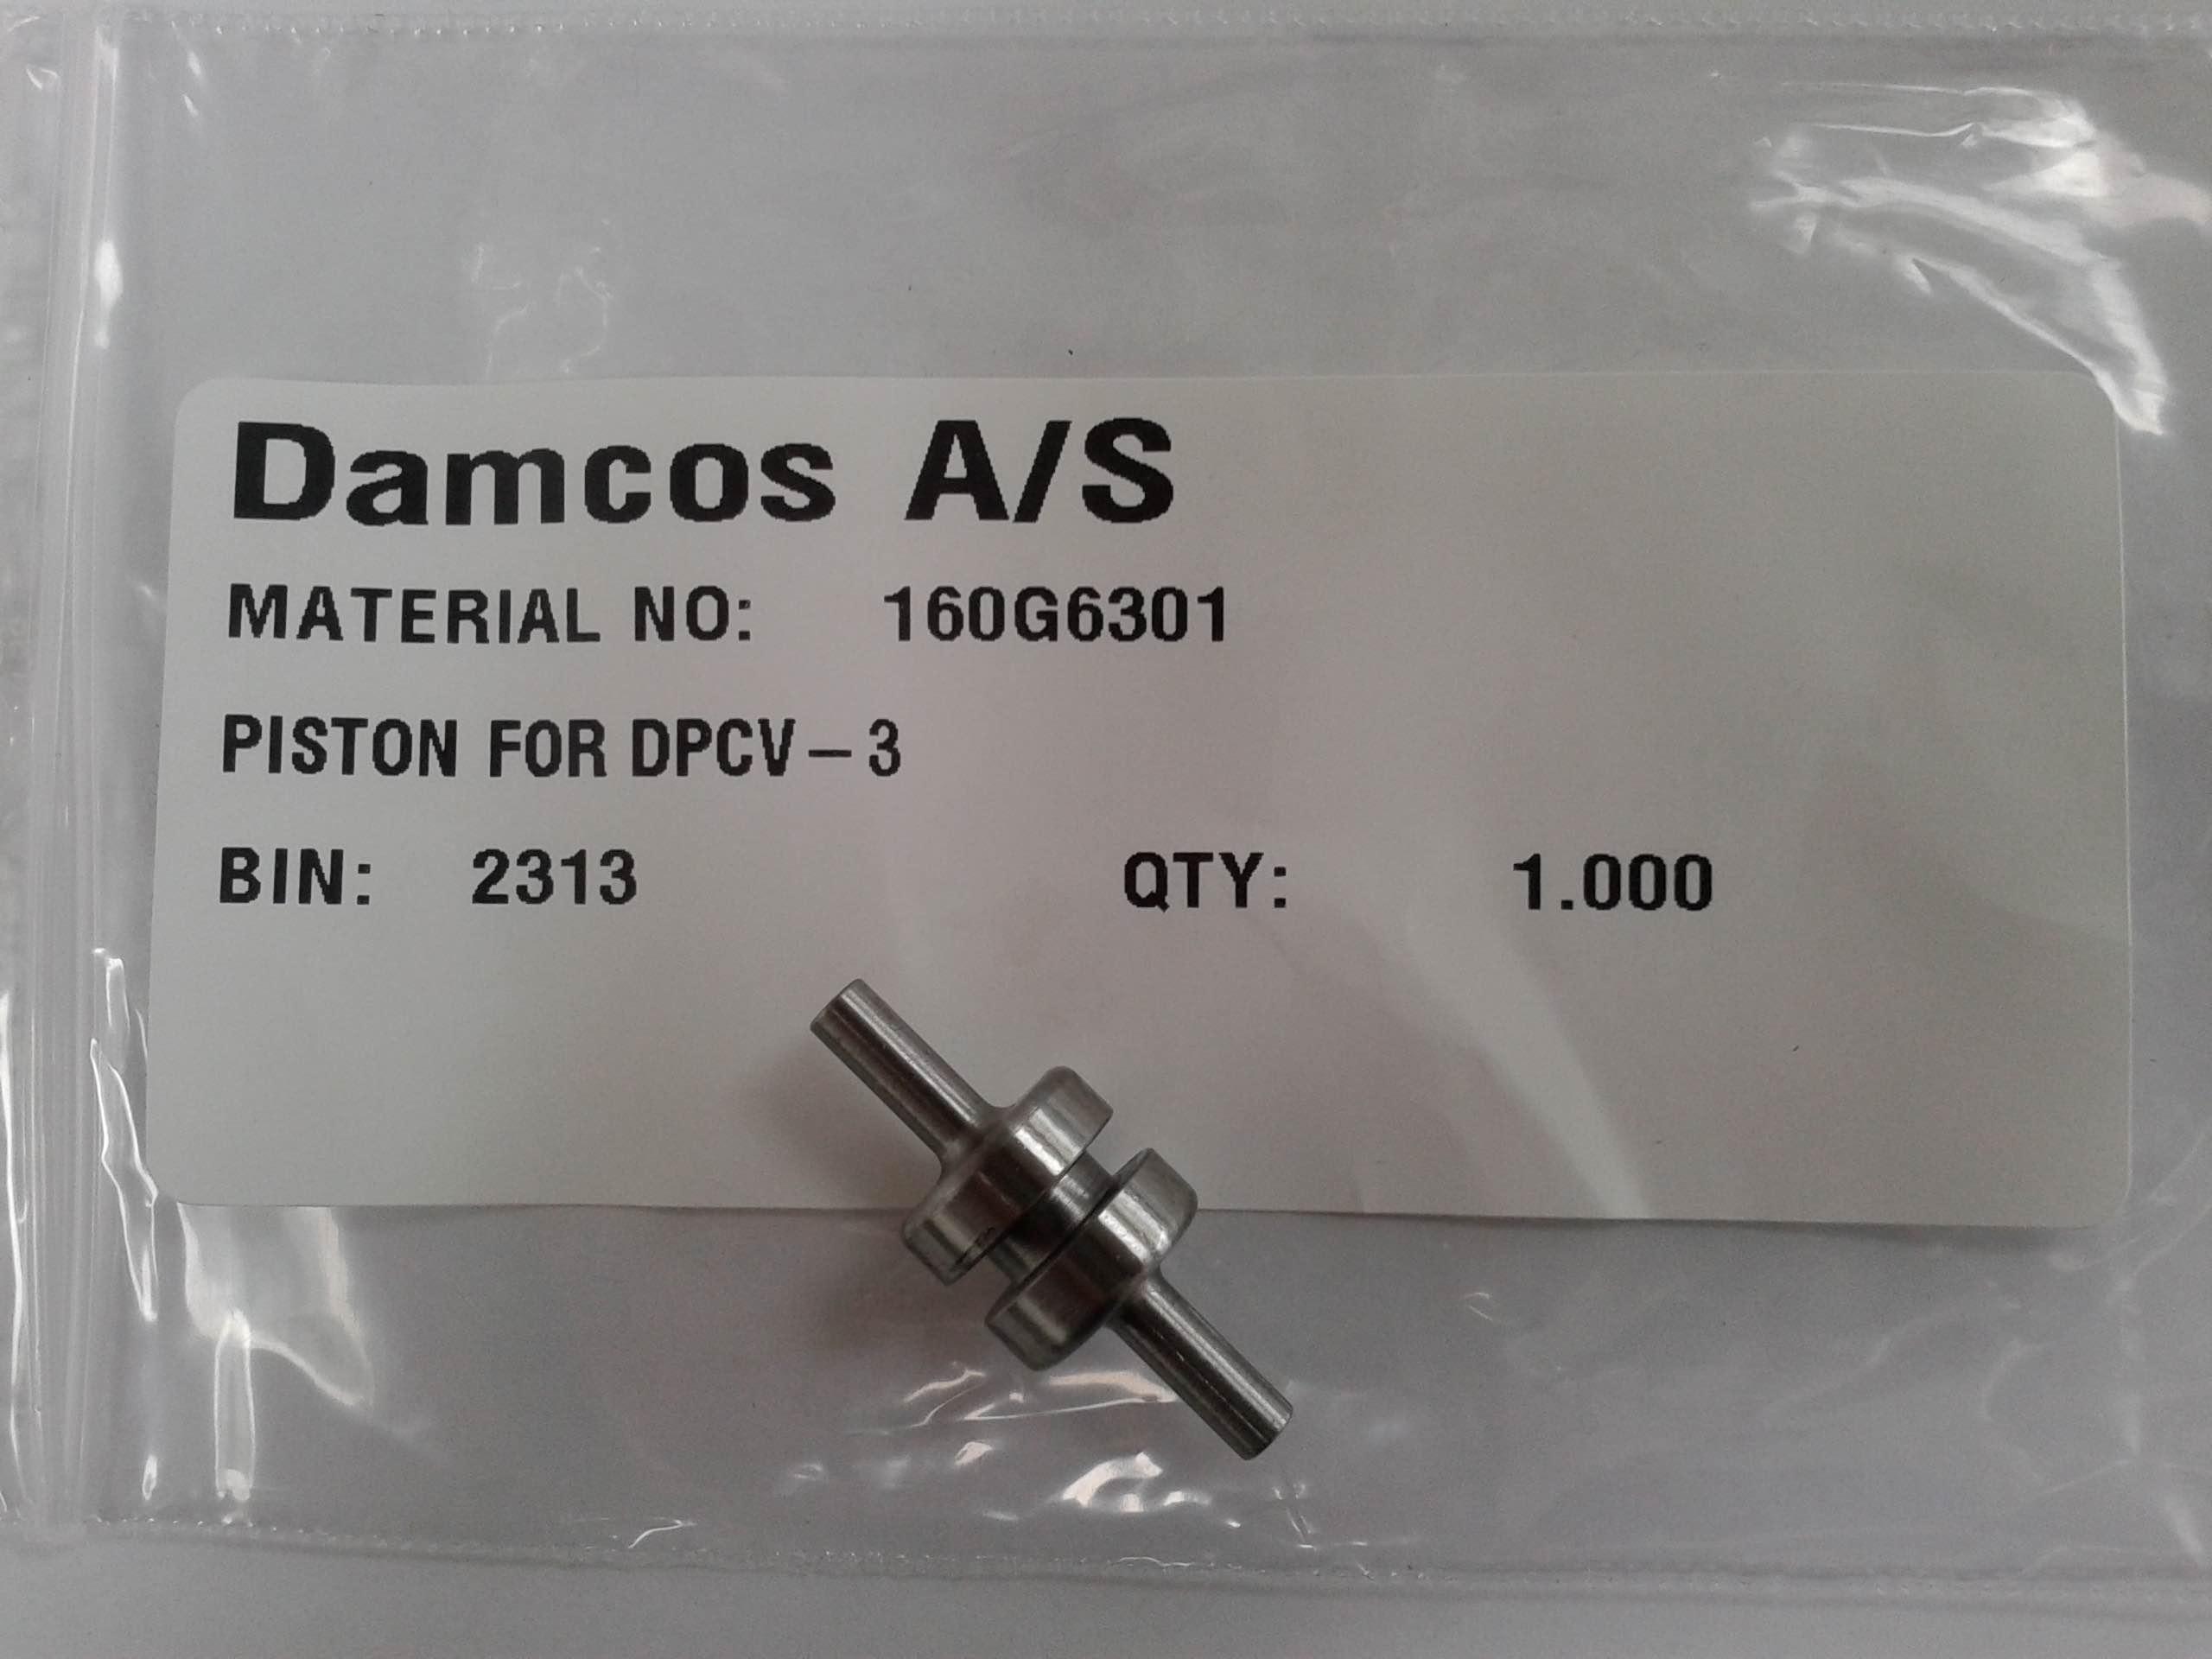 Damcos: Danfoss DPCV-3 Piston, Part No- 160G6301